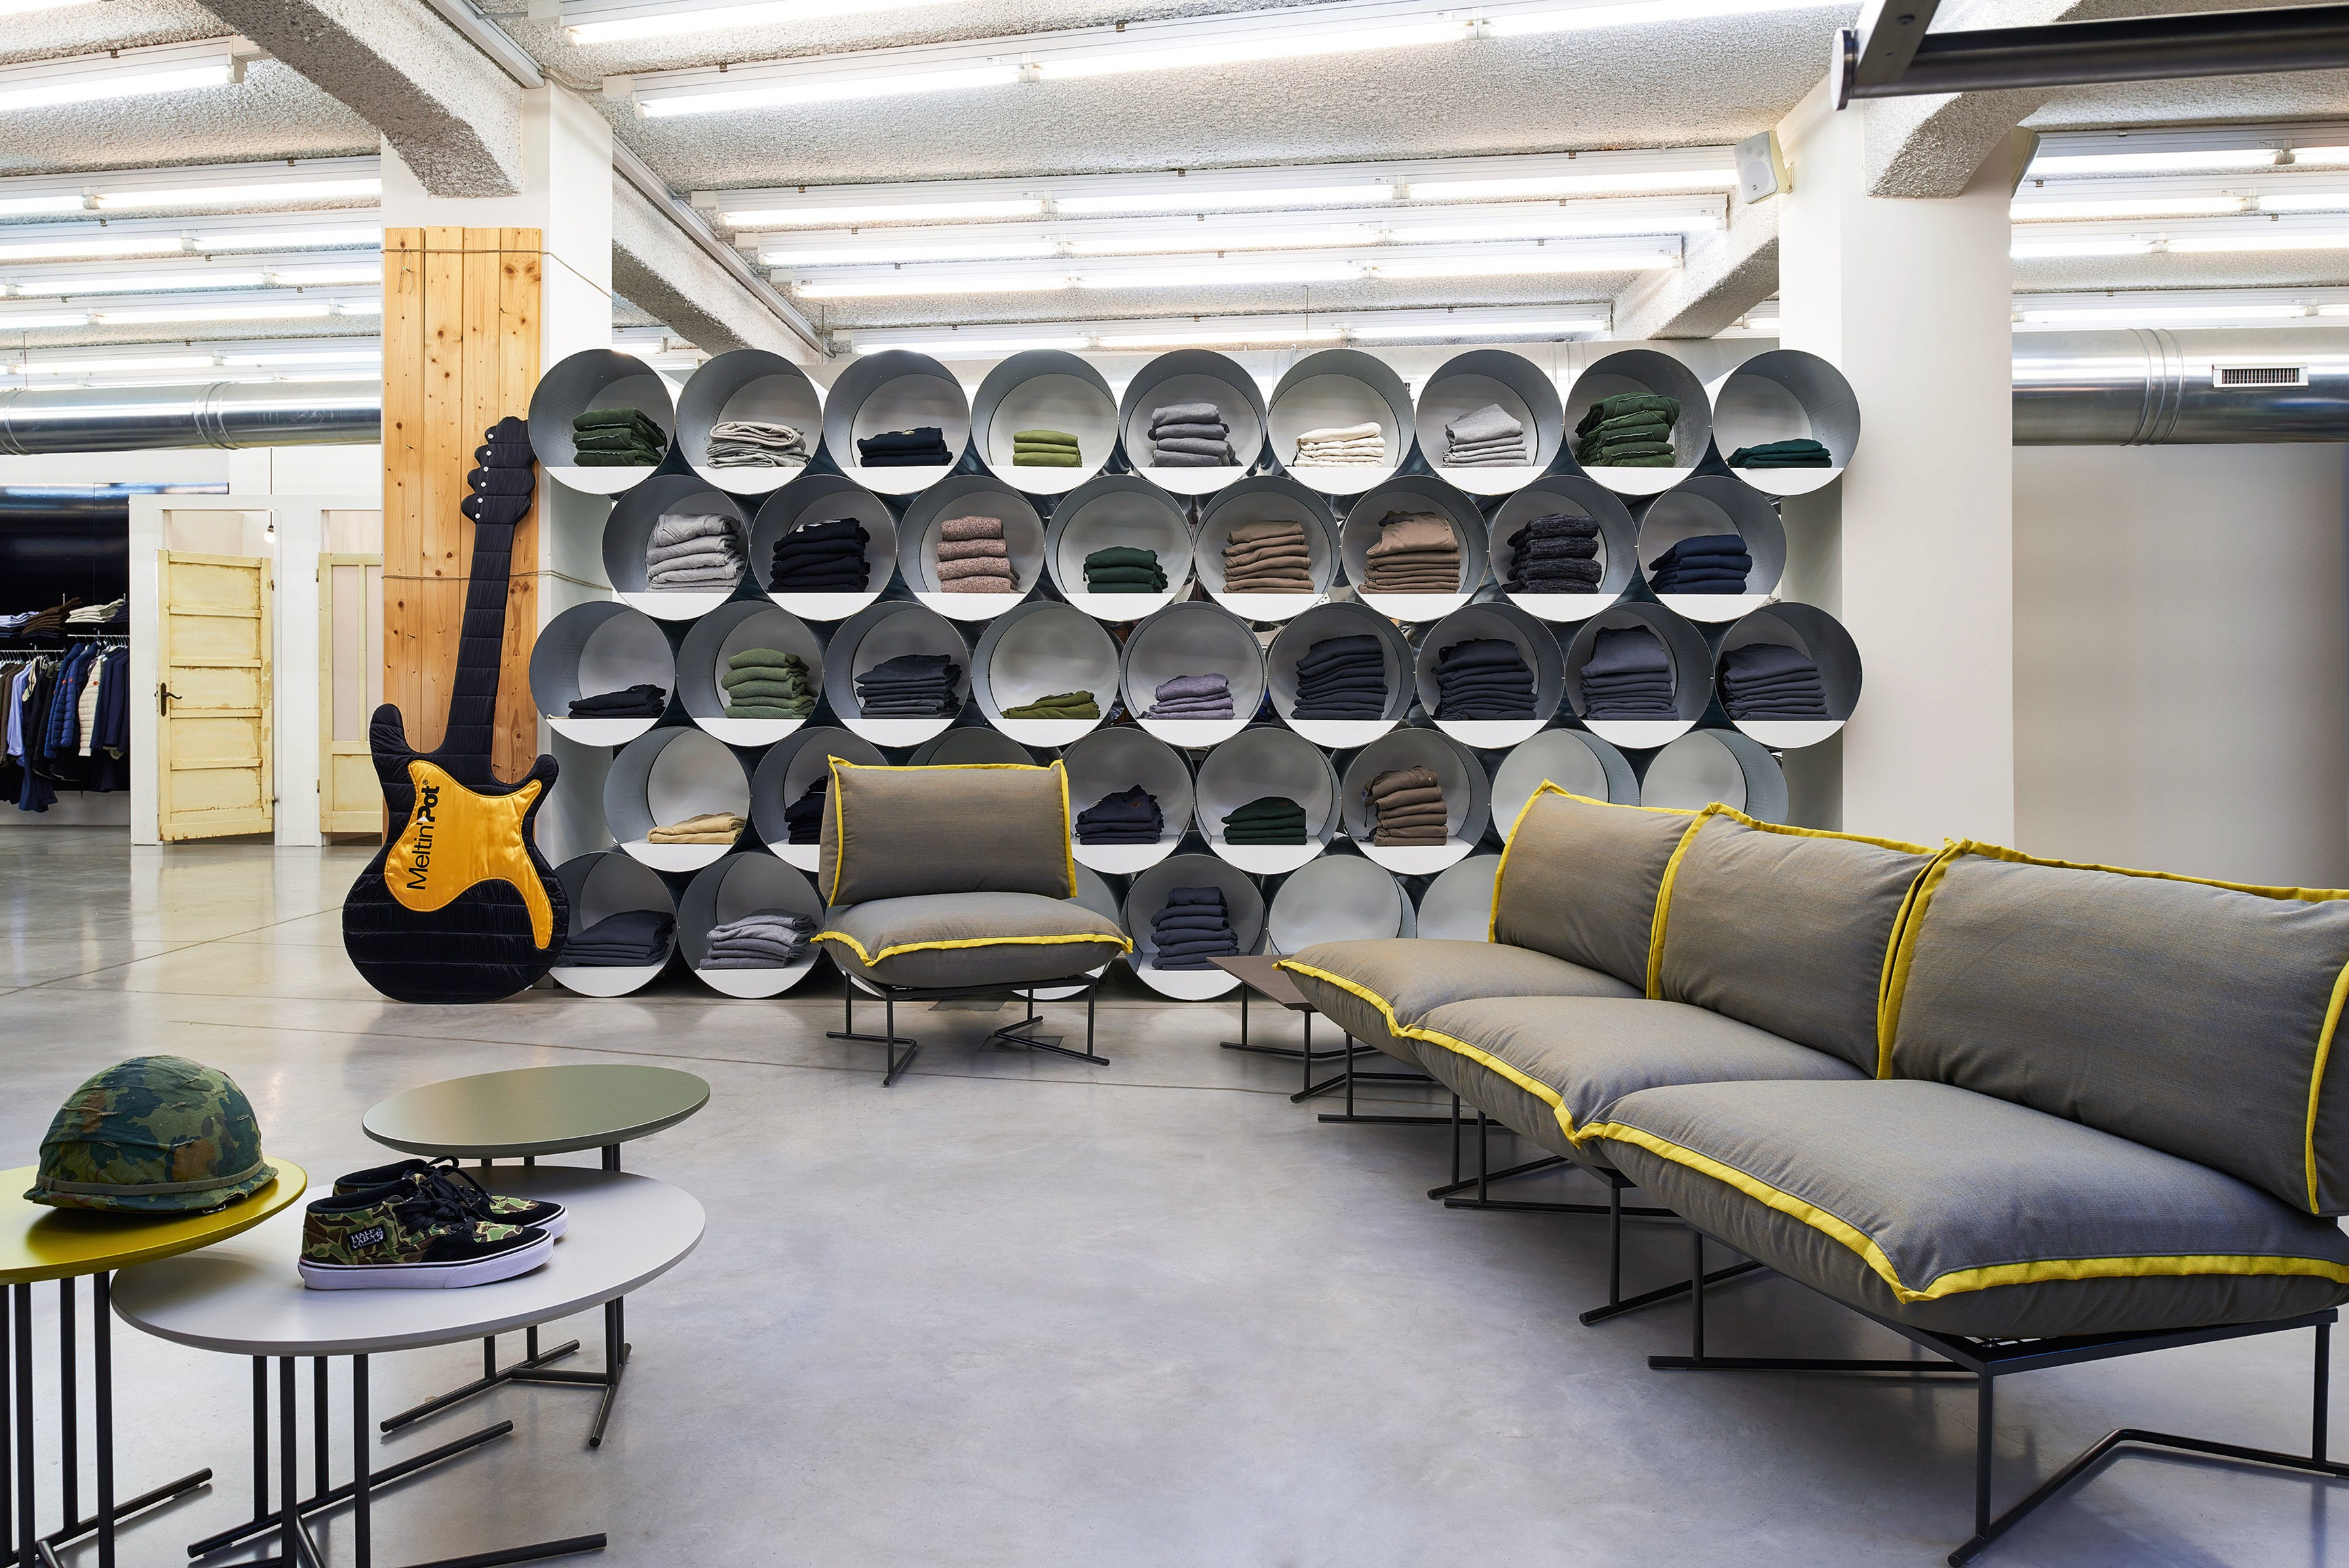 Colorado divano componibile by varaschin design daniele lo for Varaschin arredo giardino